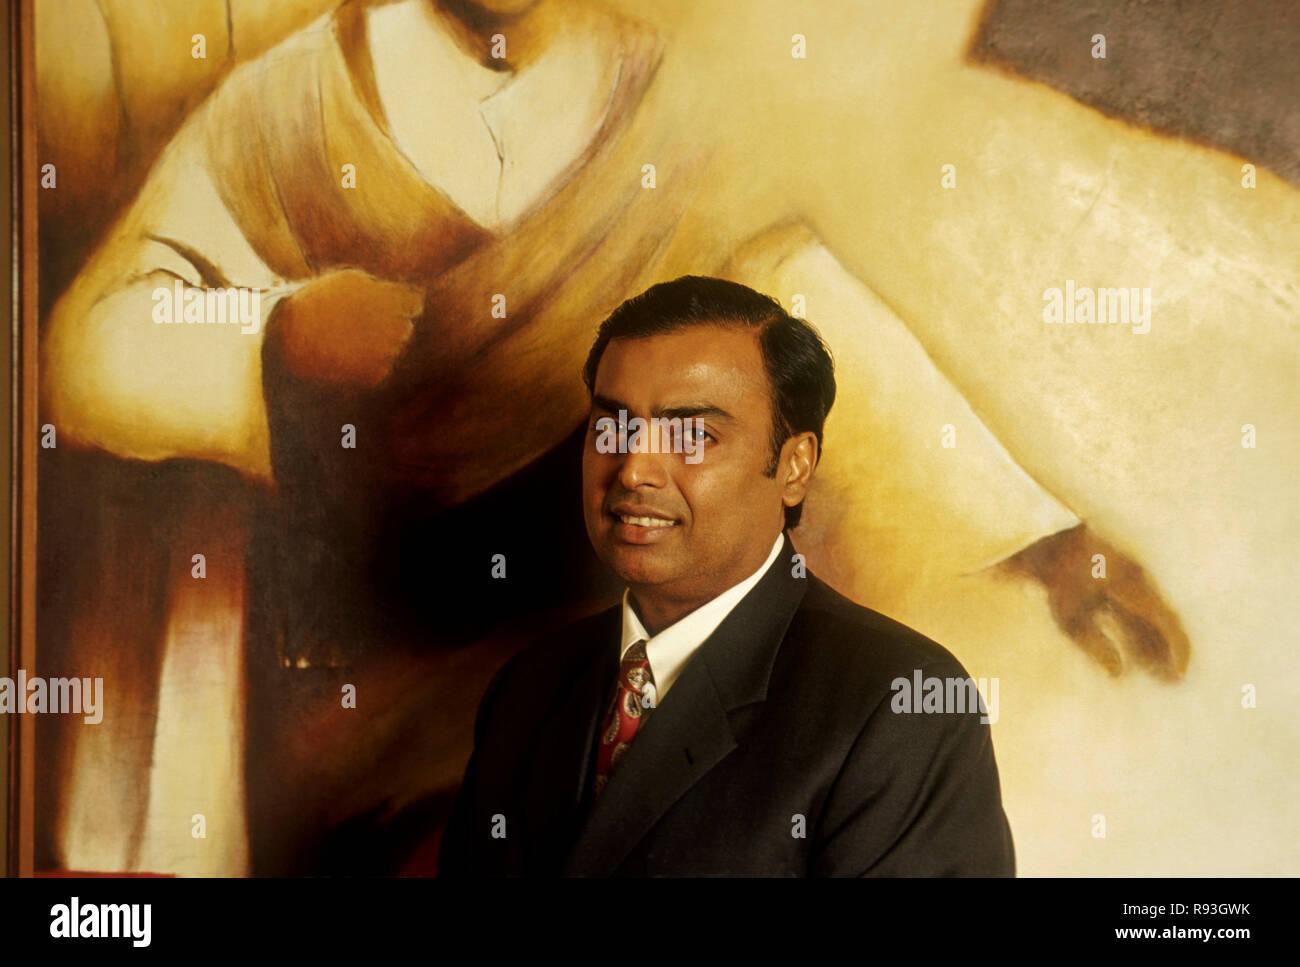 south asian indian businessman and chairman of reliance industry Mr. Mukesh Ambani, India NO MR - Stock Image